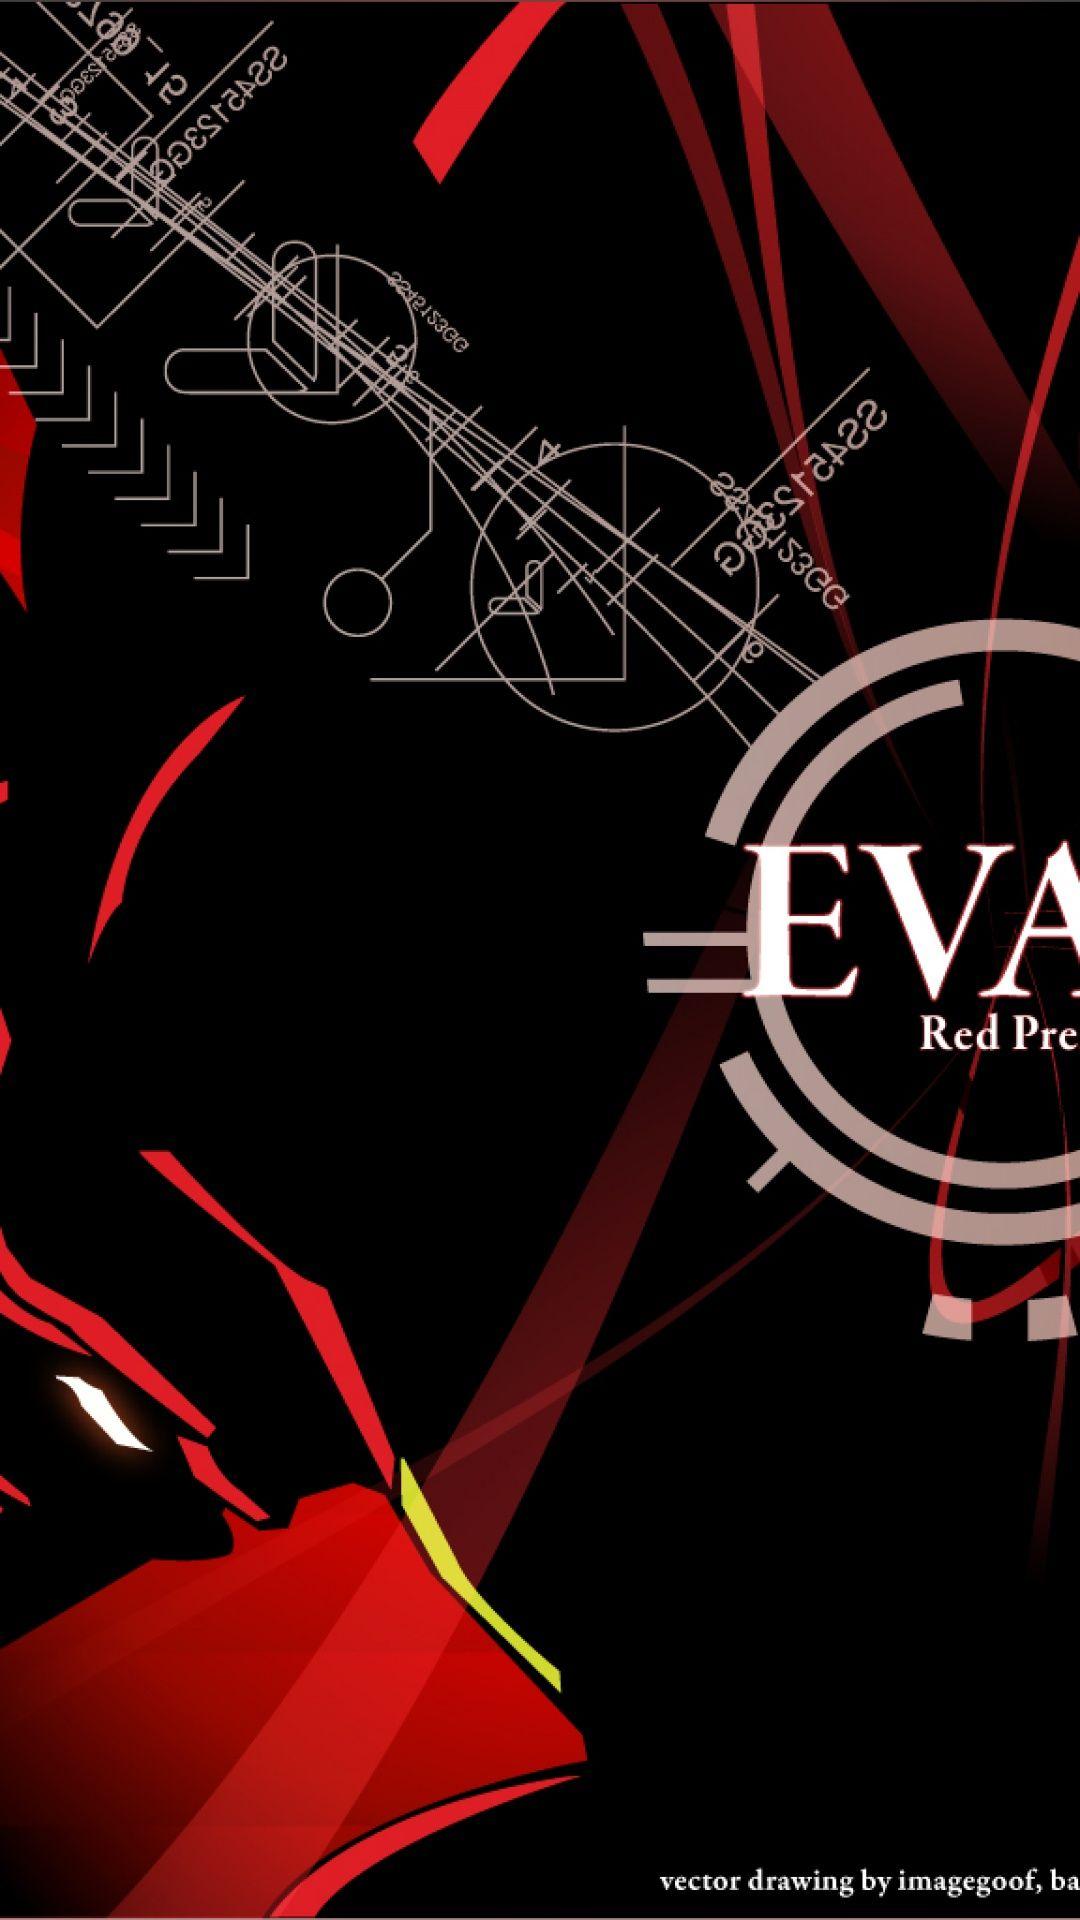 New Iphone Wallpaper Iphone Wallpaper Evangelion Wallpaper Neon Genesis Evangelion Neogenesis Evangelion